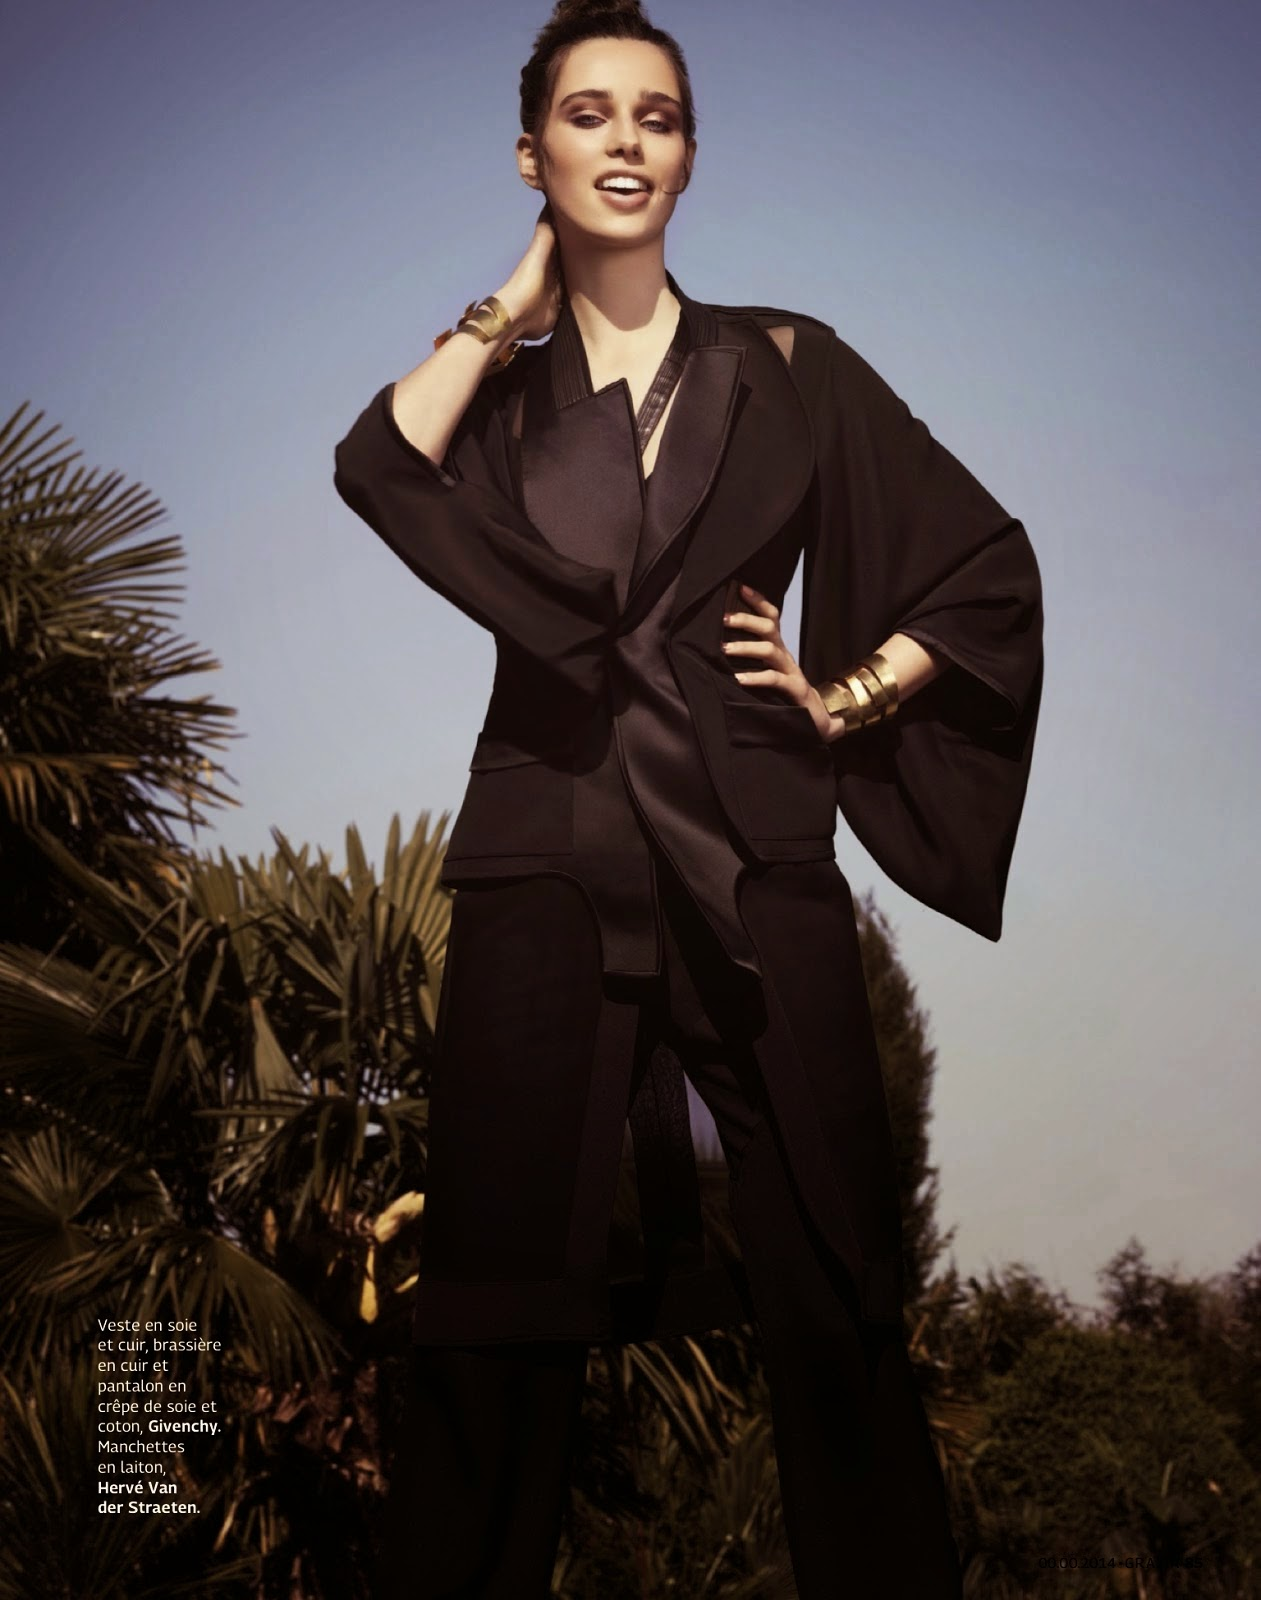 Robin Van Halteren by Naomi Yang for Grazia Magazine, France, May 2014